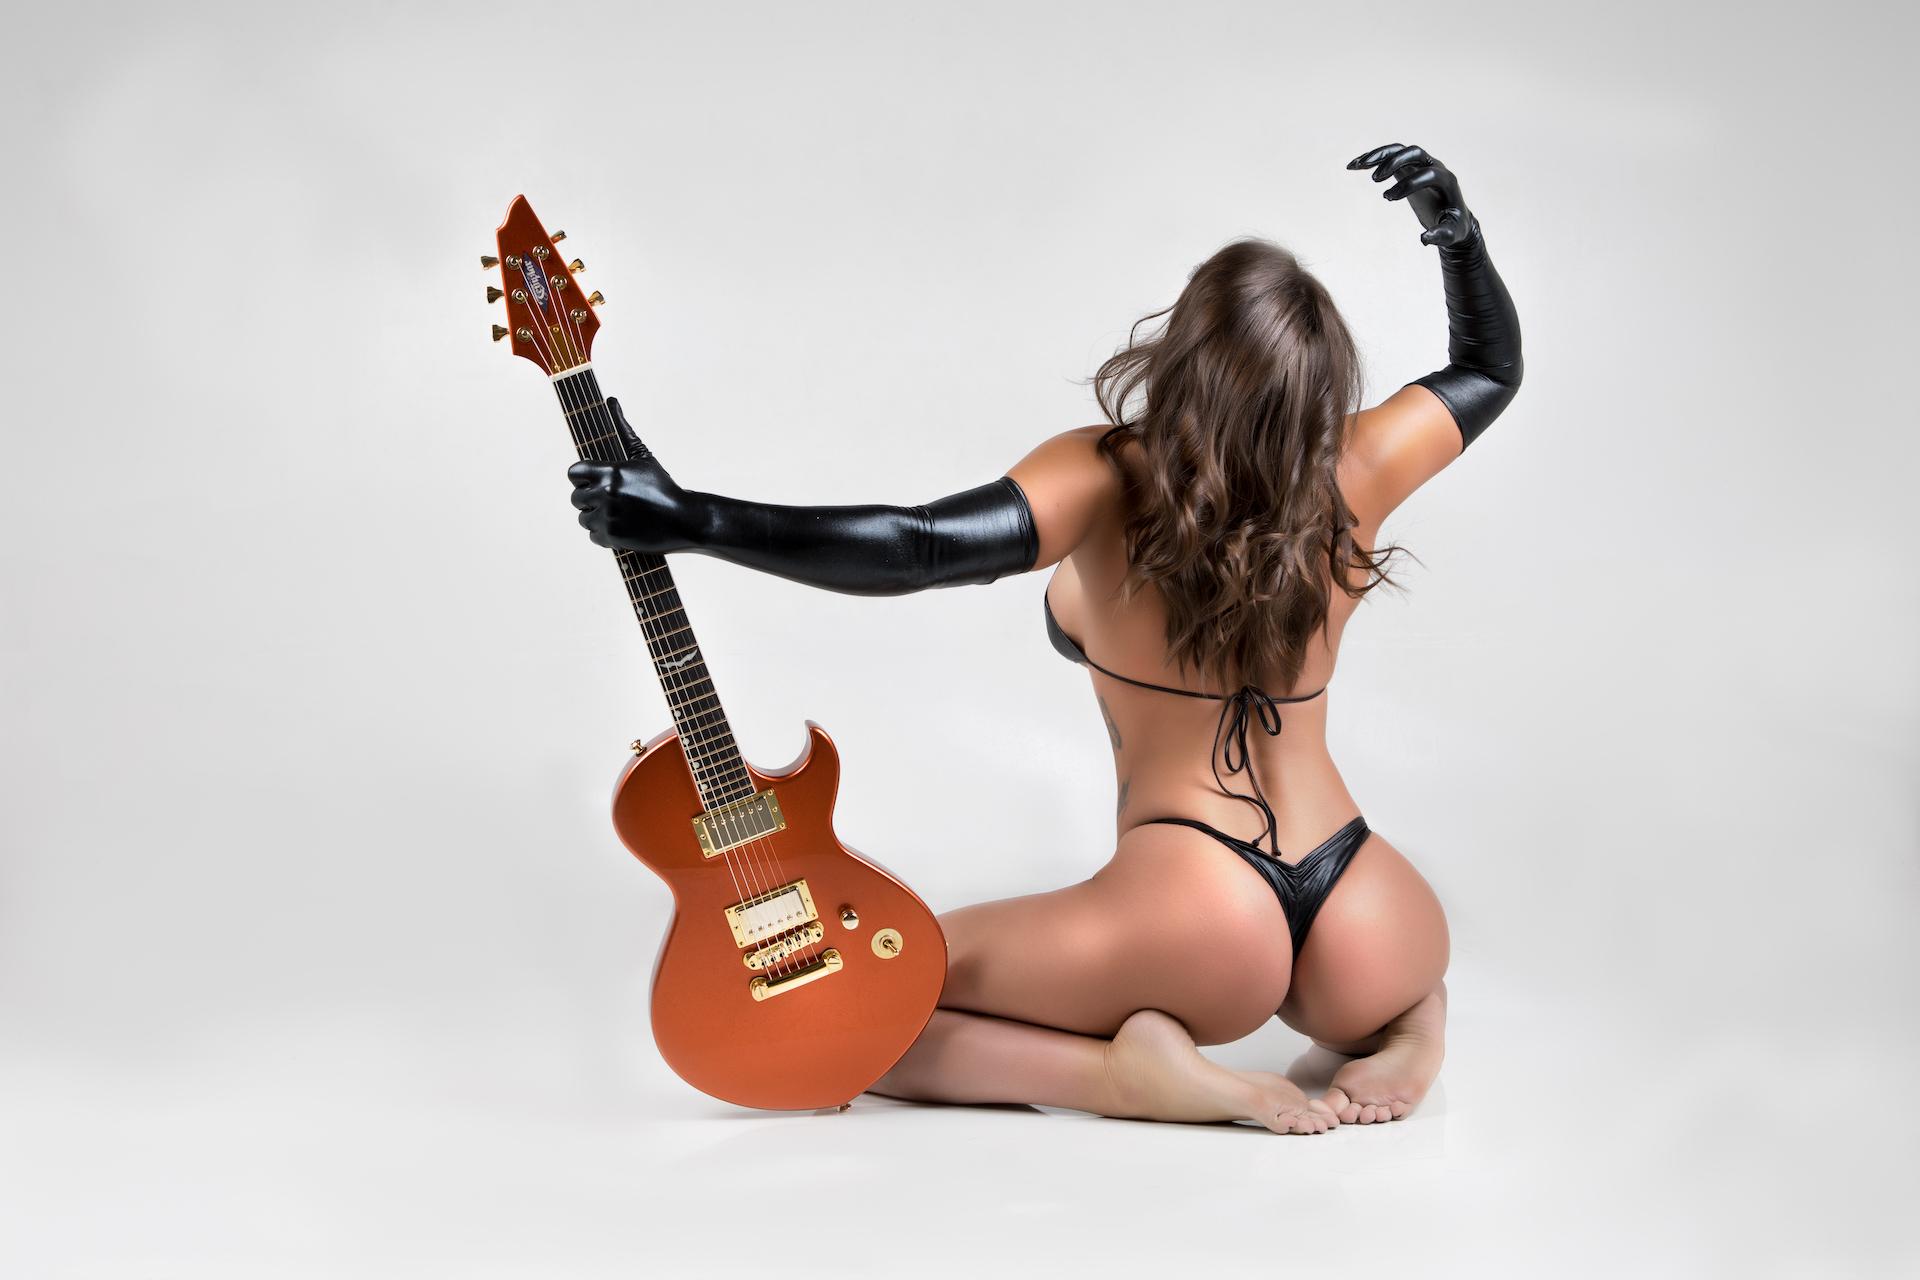 Guitar1017Courtney - IMGL9337-Edit.jpg